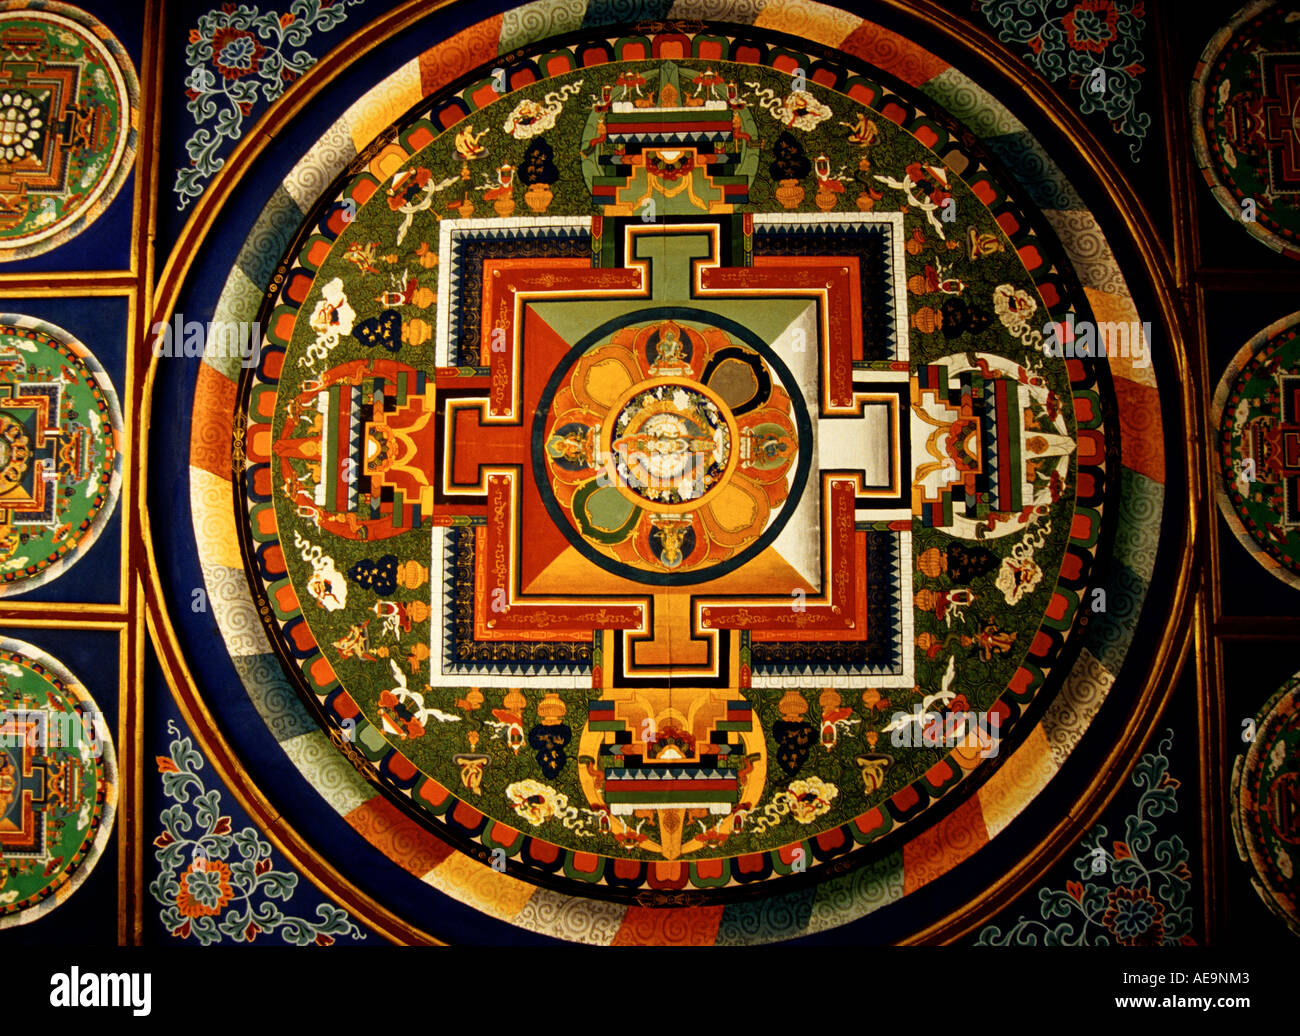 Mandala on ceiling of stupa near Potala Palace in Lhasa Tibet - Stock Image